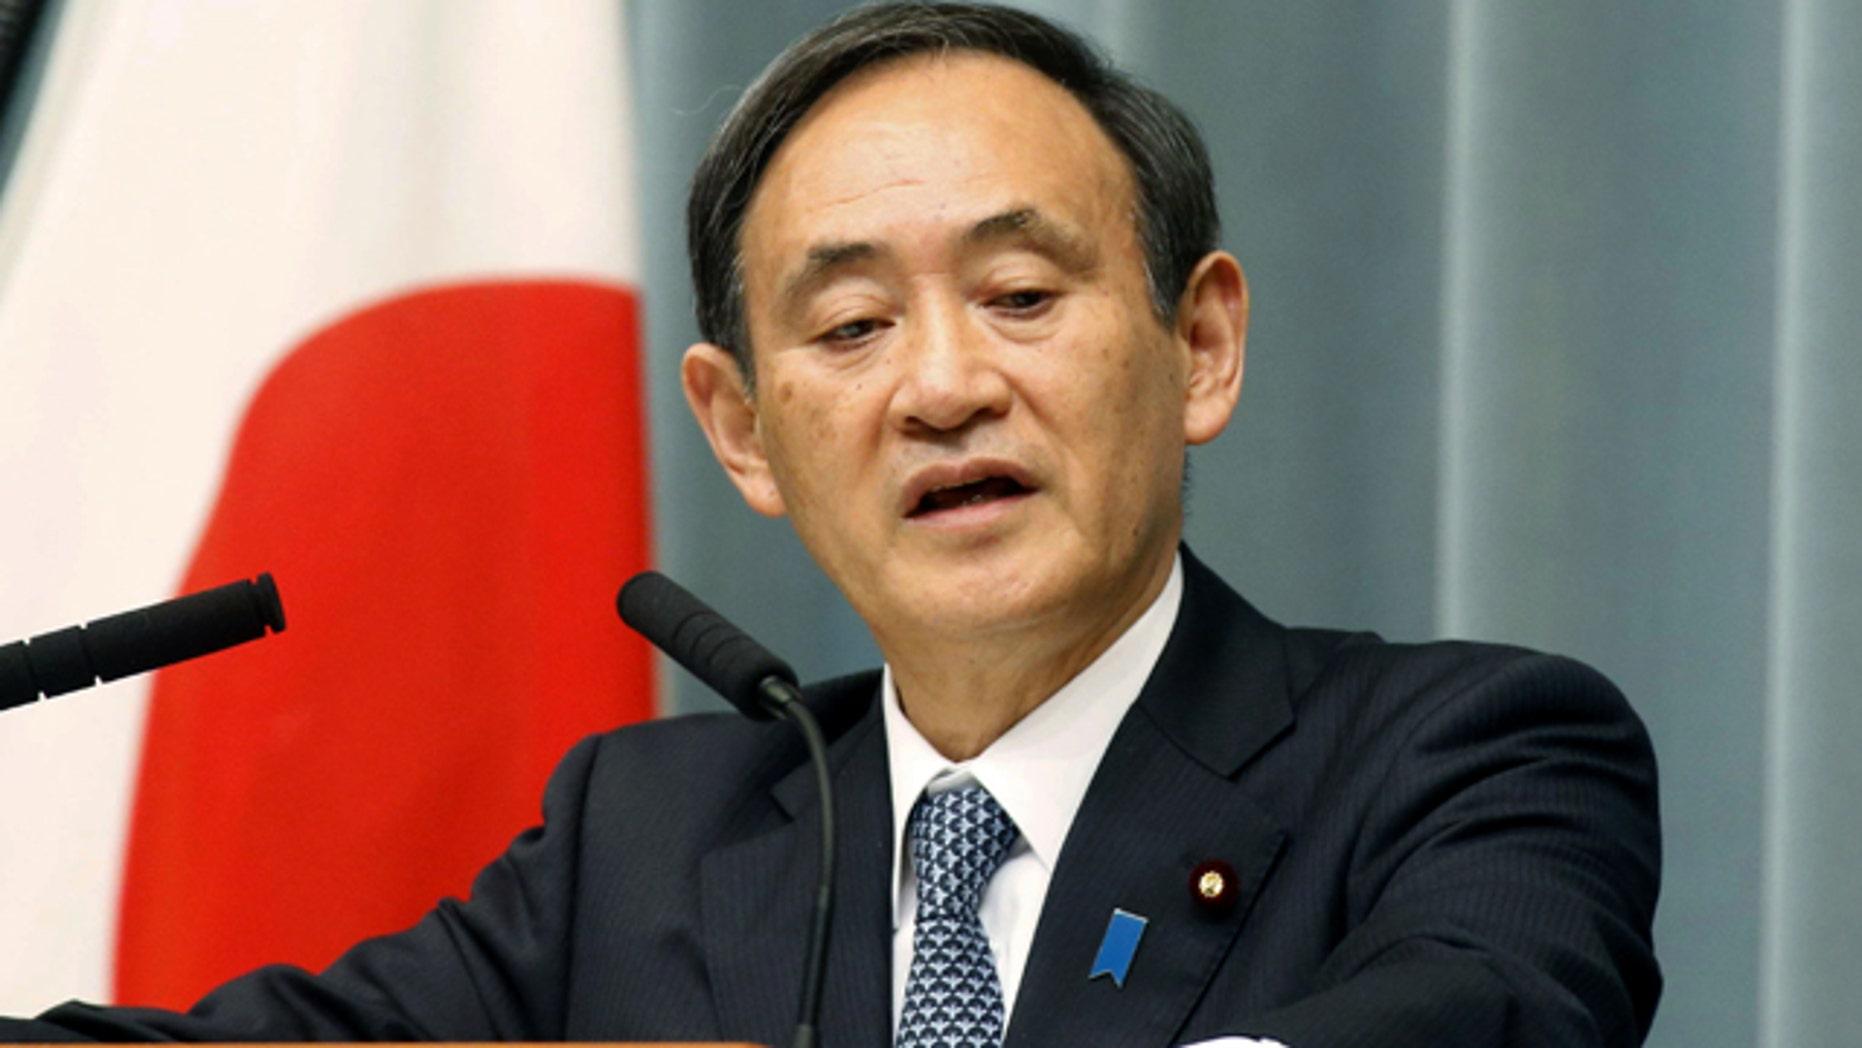 Jan. 26, 2015: Japan's government spokesman Yoshihide Suga speaks at a press conference in Tokyo. (AP Photo/Kyodo News)